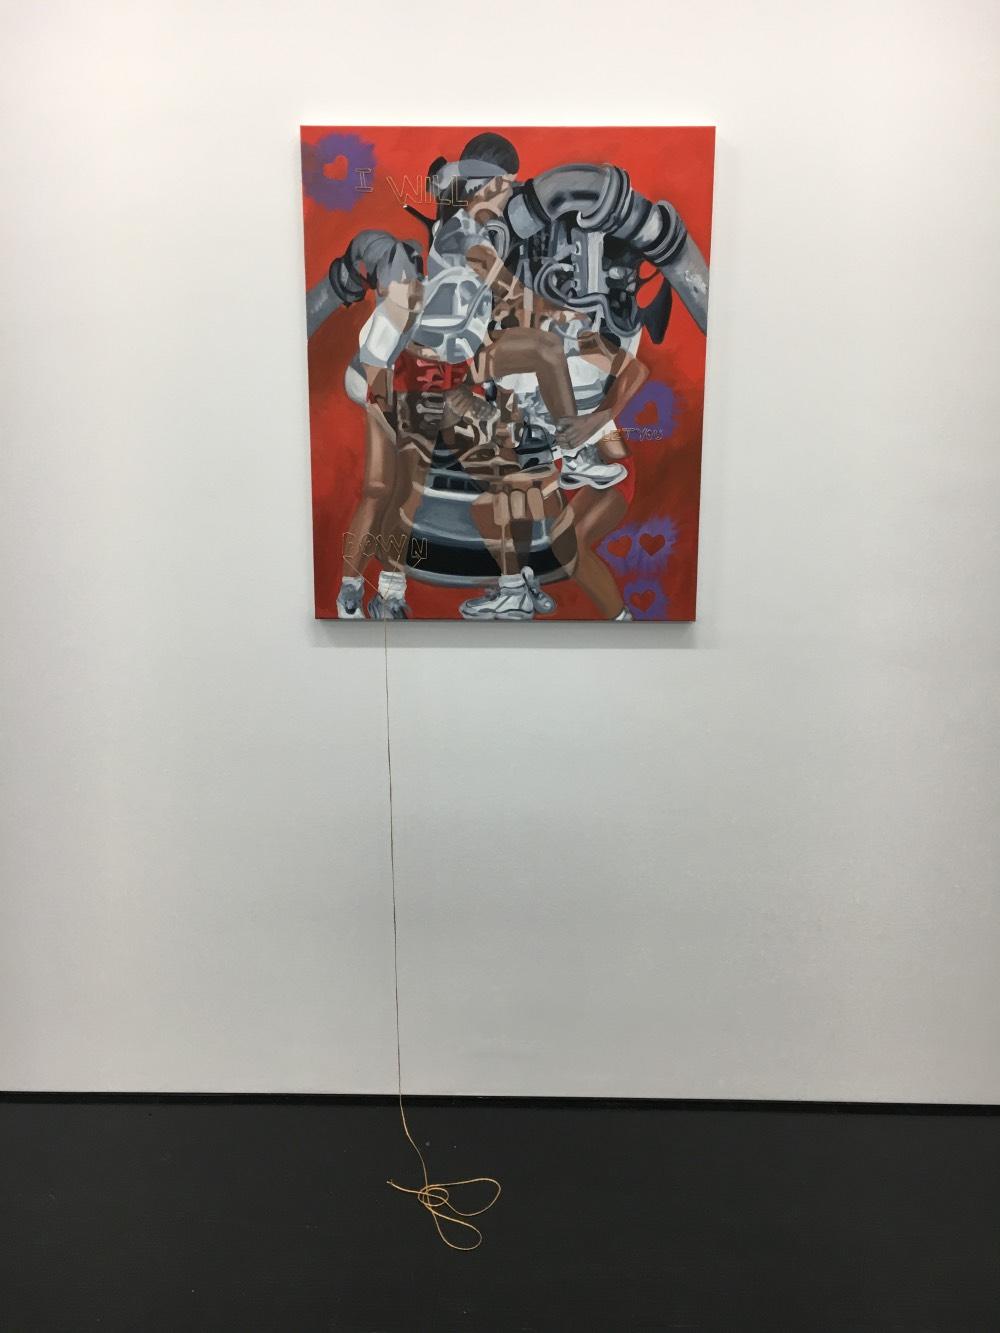 Frieda-Toranzo-Jaeger-Galerie-Barbara-Weiss